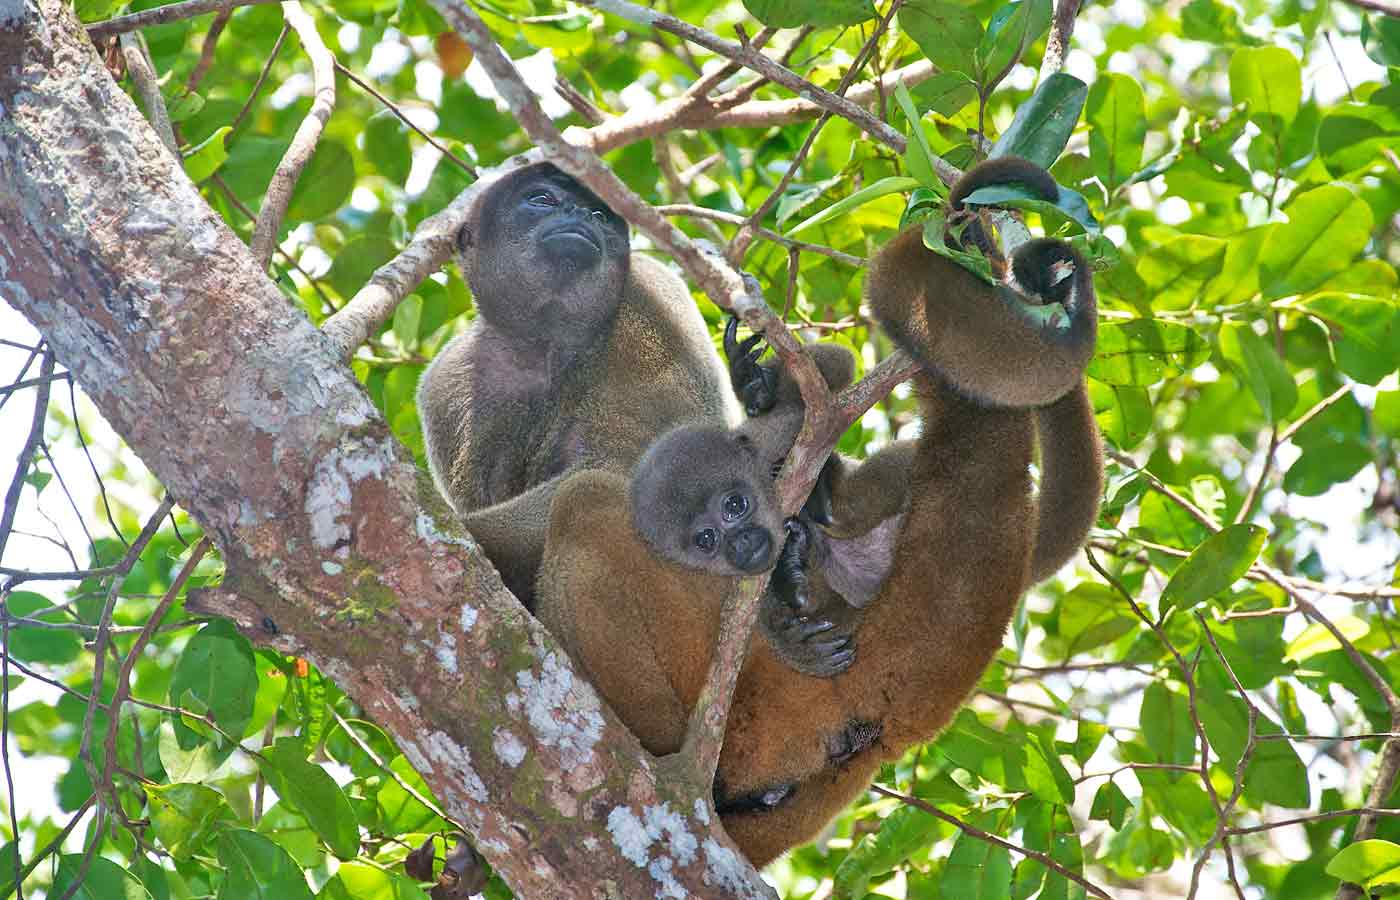 Woolly Monkeys in the canopy of the Amazon Rainforest in Brazil